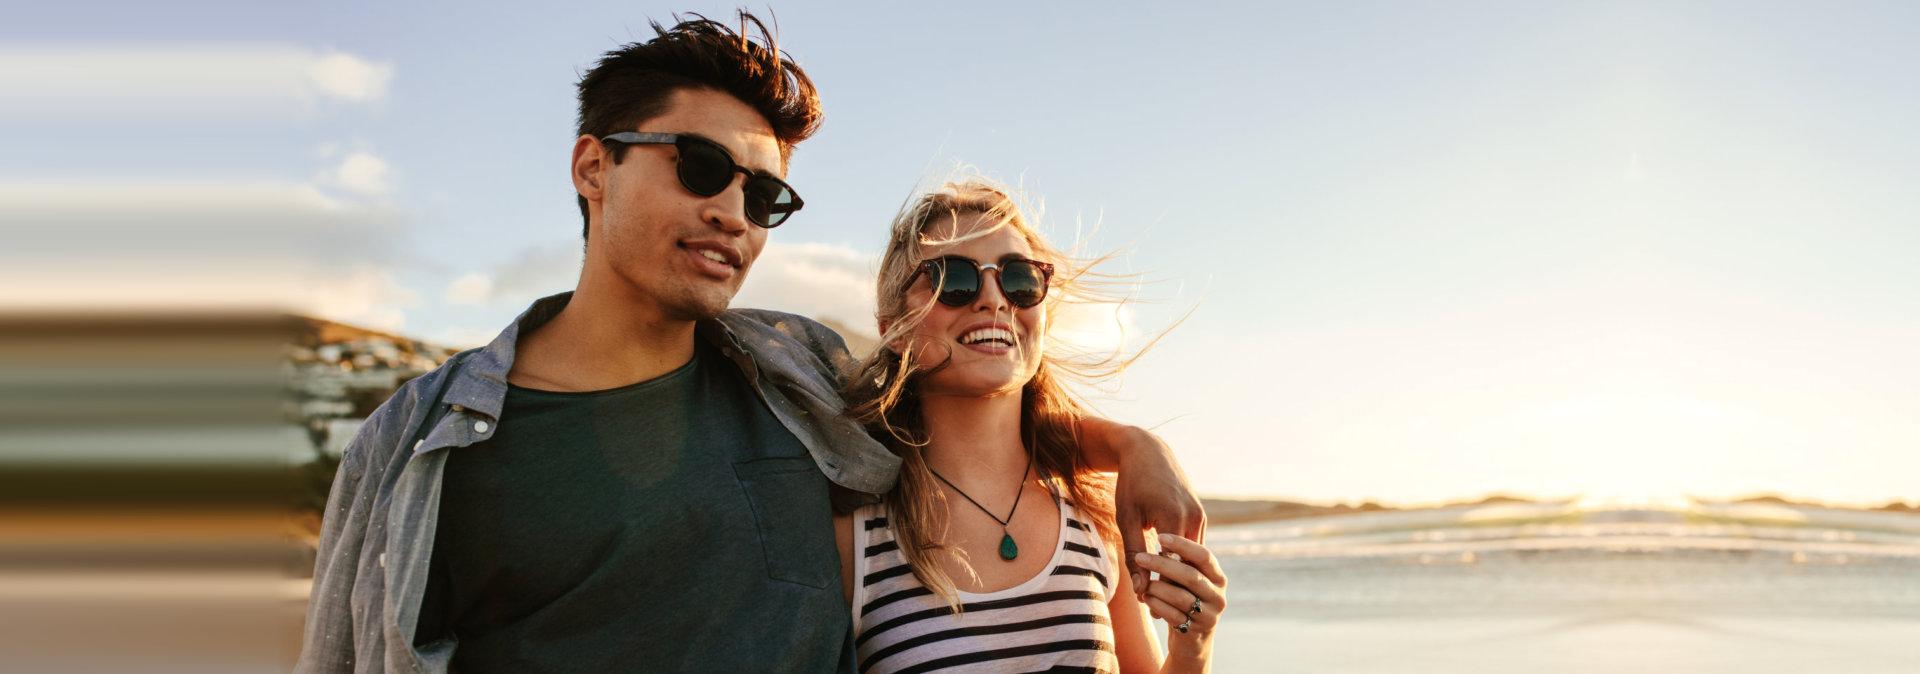 Young couple enjoying a summer day on seashore